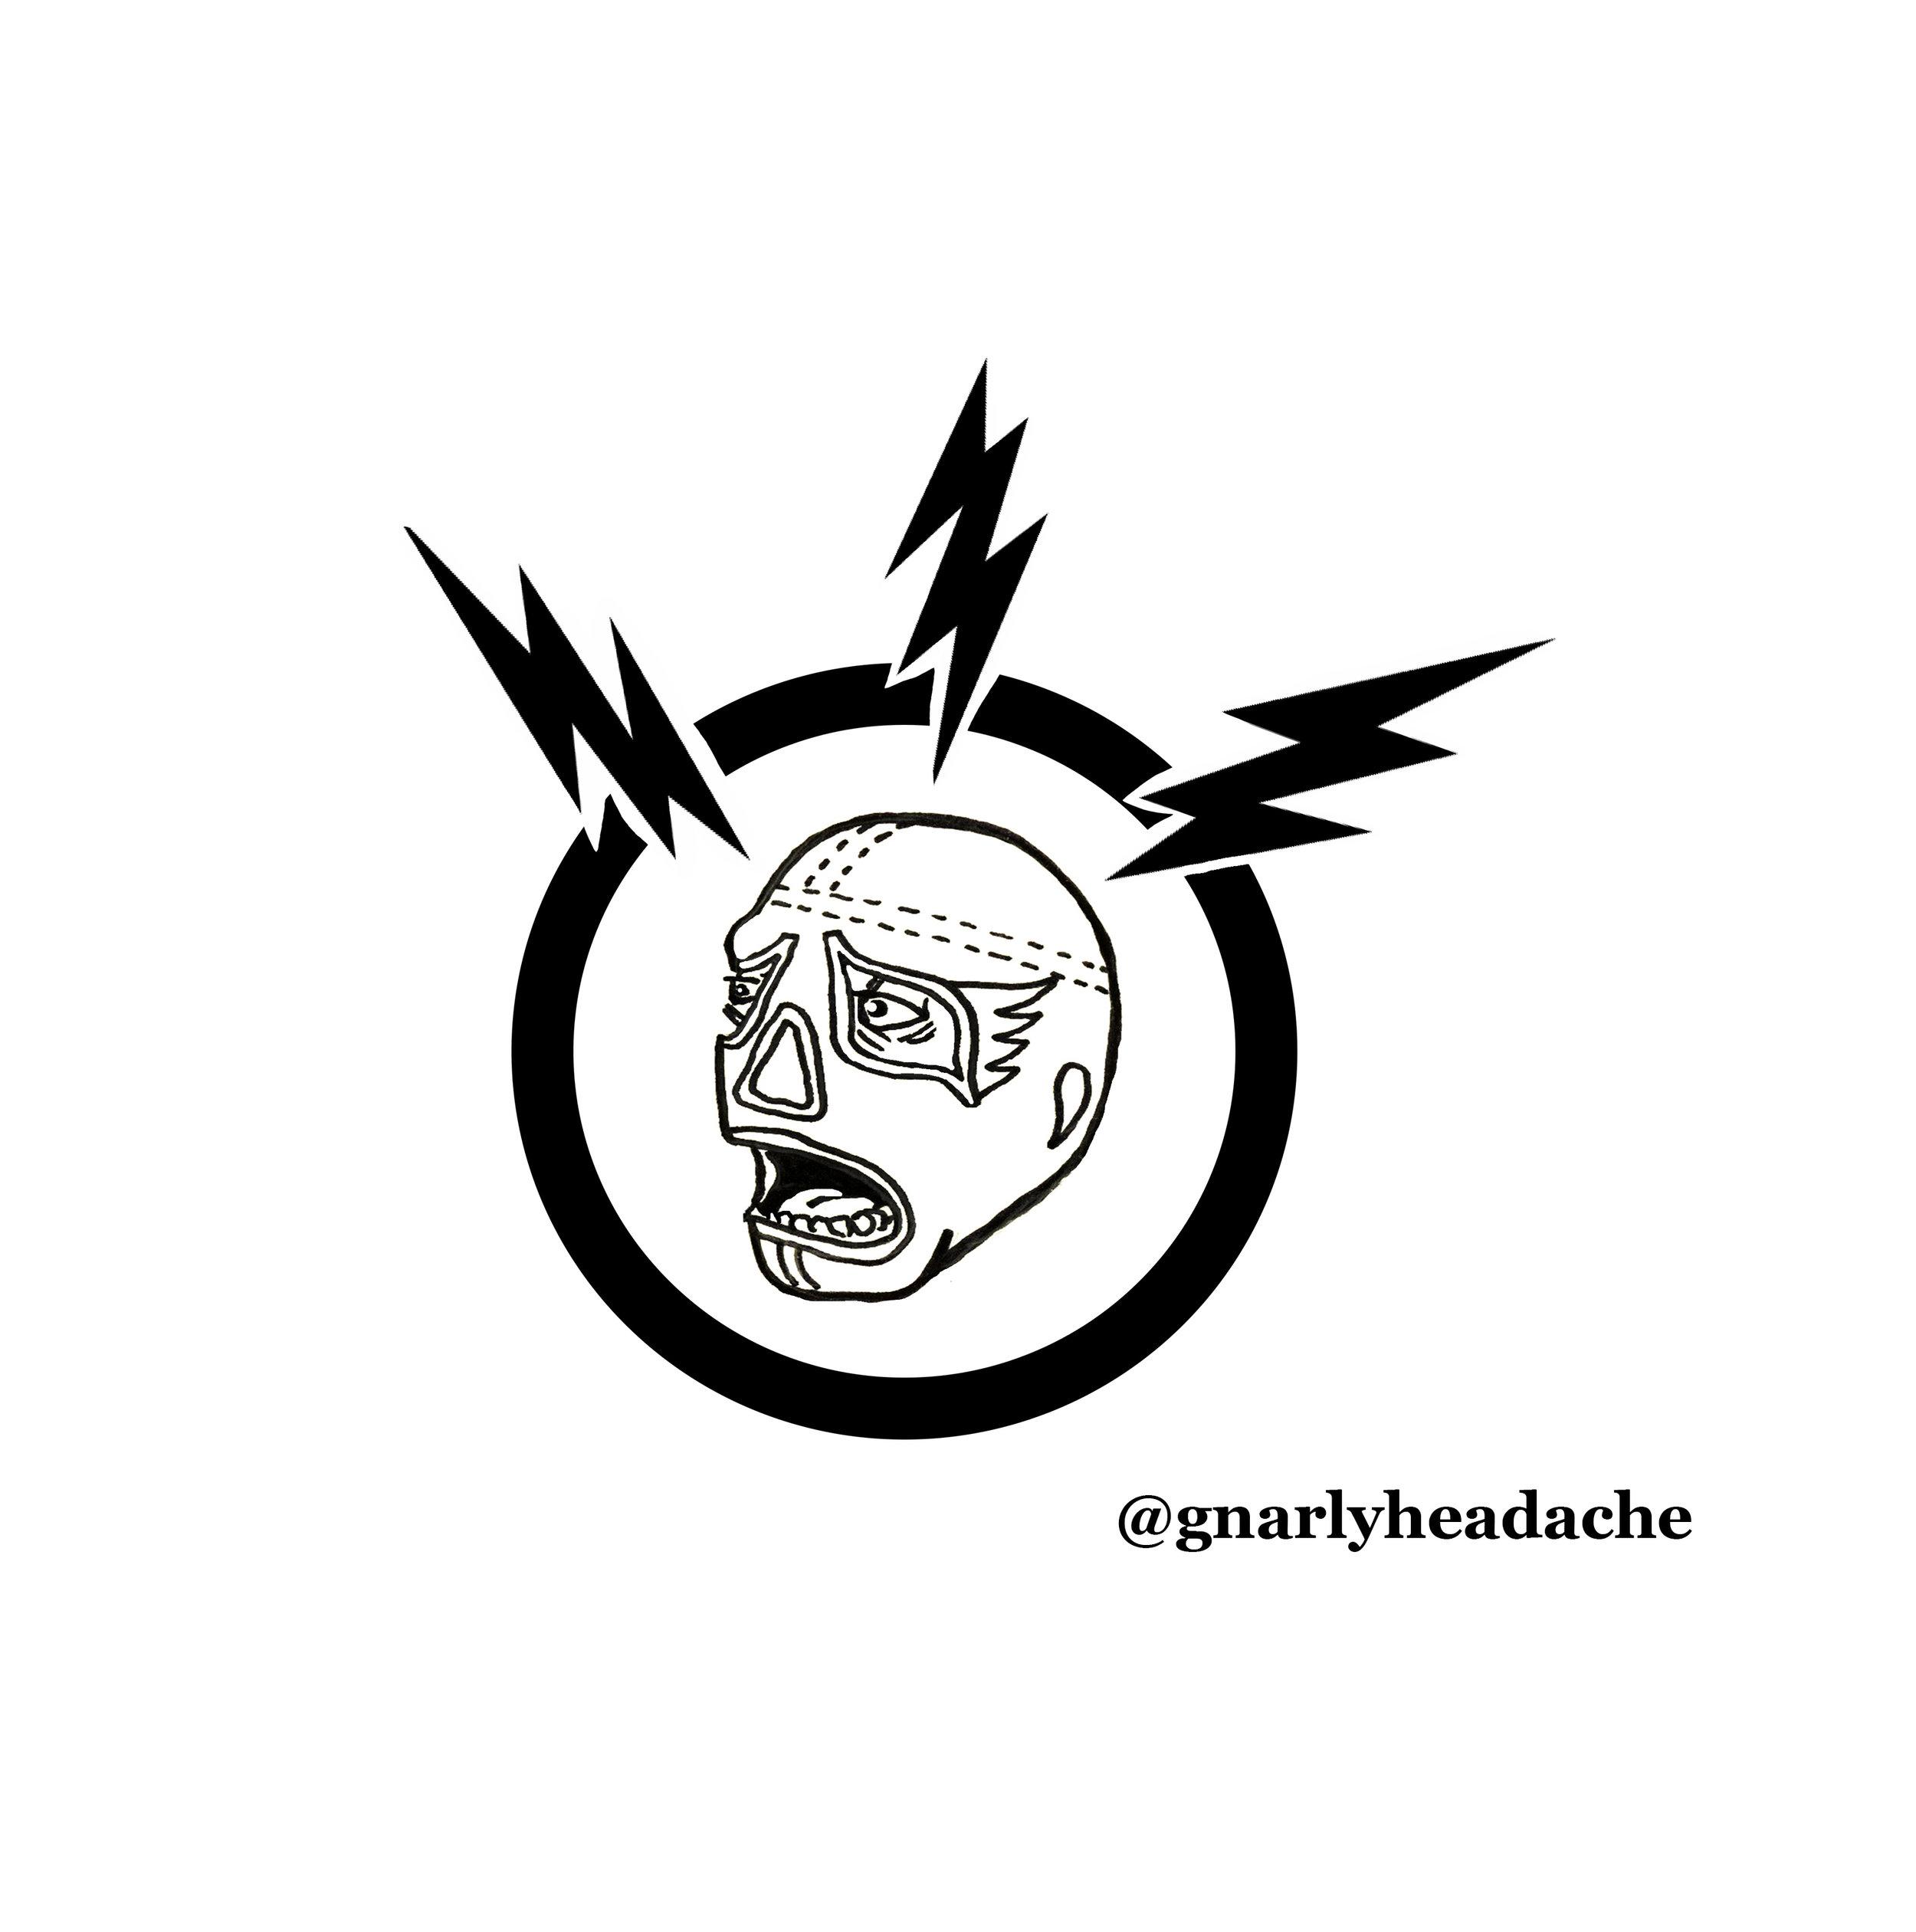 lucha head logo.jpg